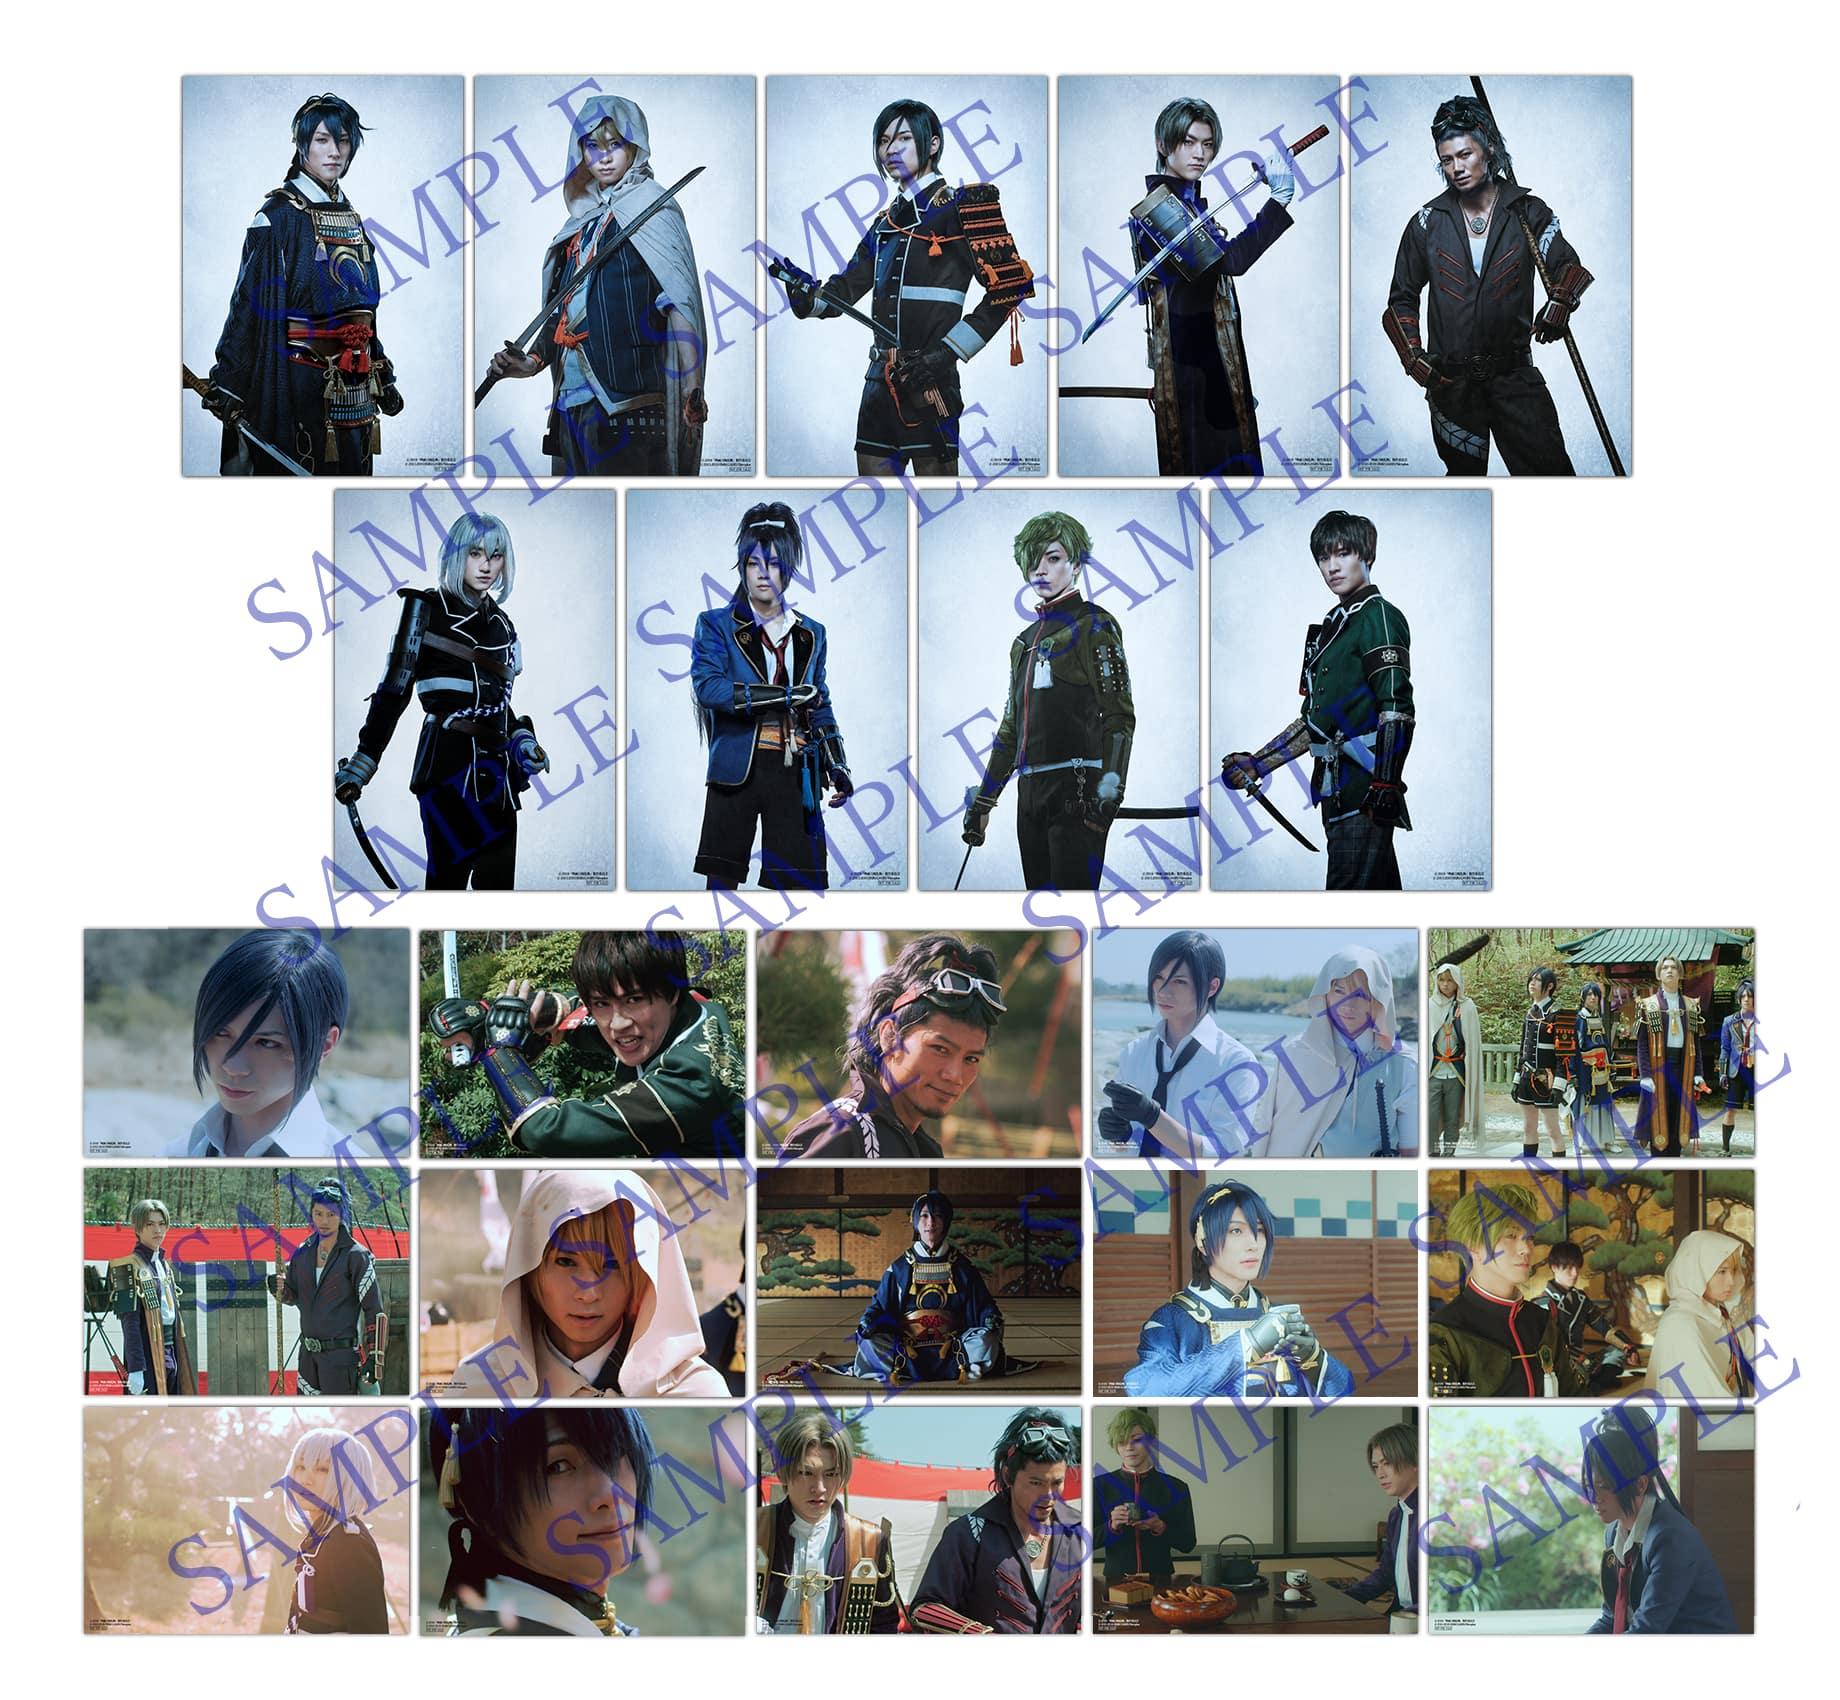 【TOHO animation STORE 限定版】映画刀剣乱舞-継承- Blu-ray 豪華版 +グラスジュエリーセット